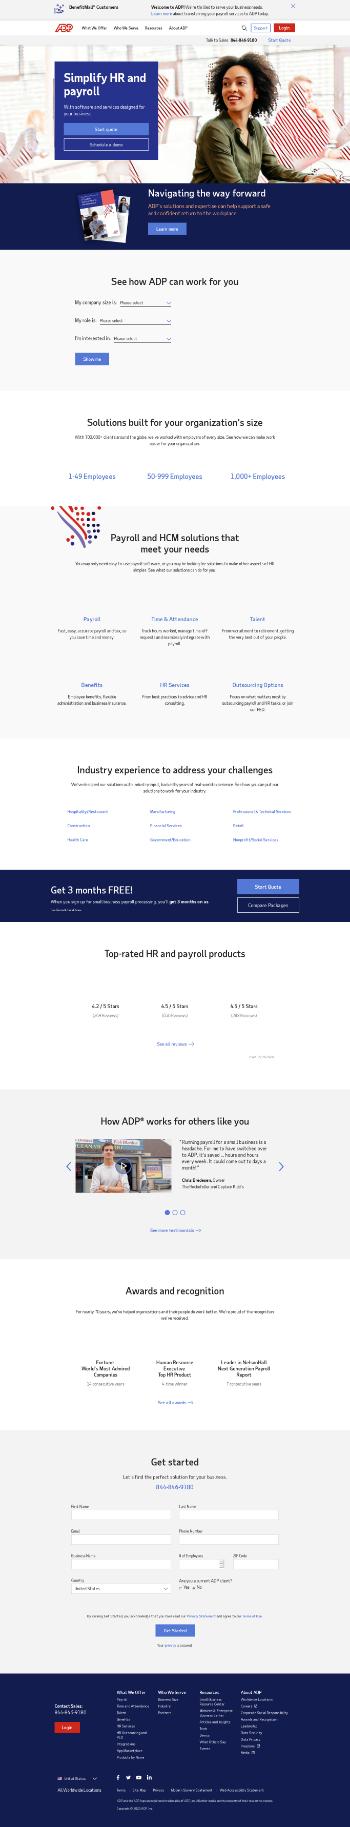 Automatic Data Processing, Inc. Website Screenshot